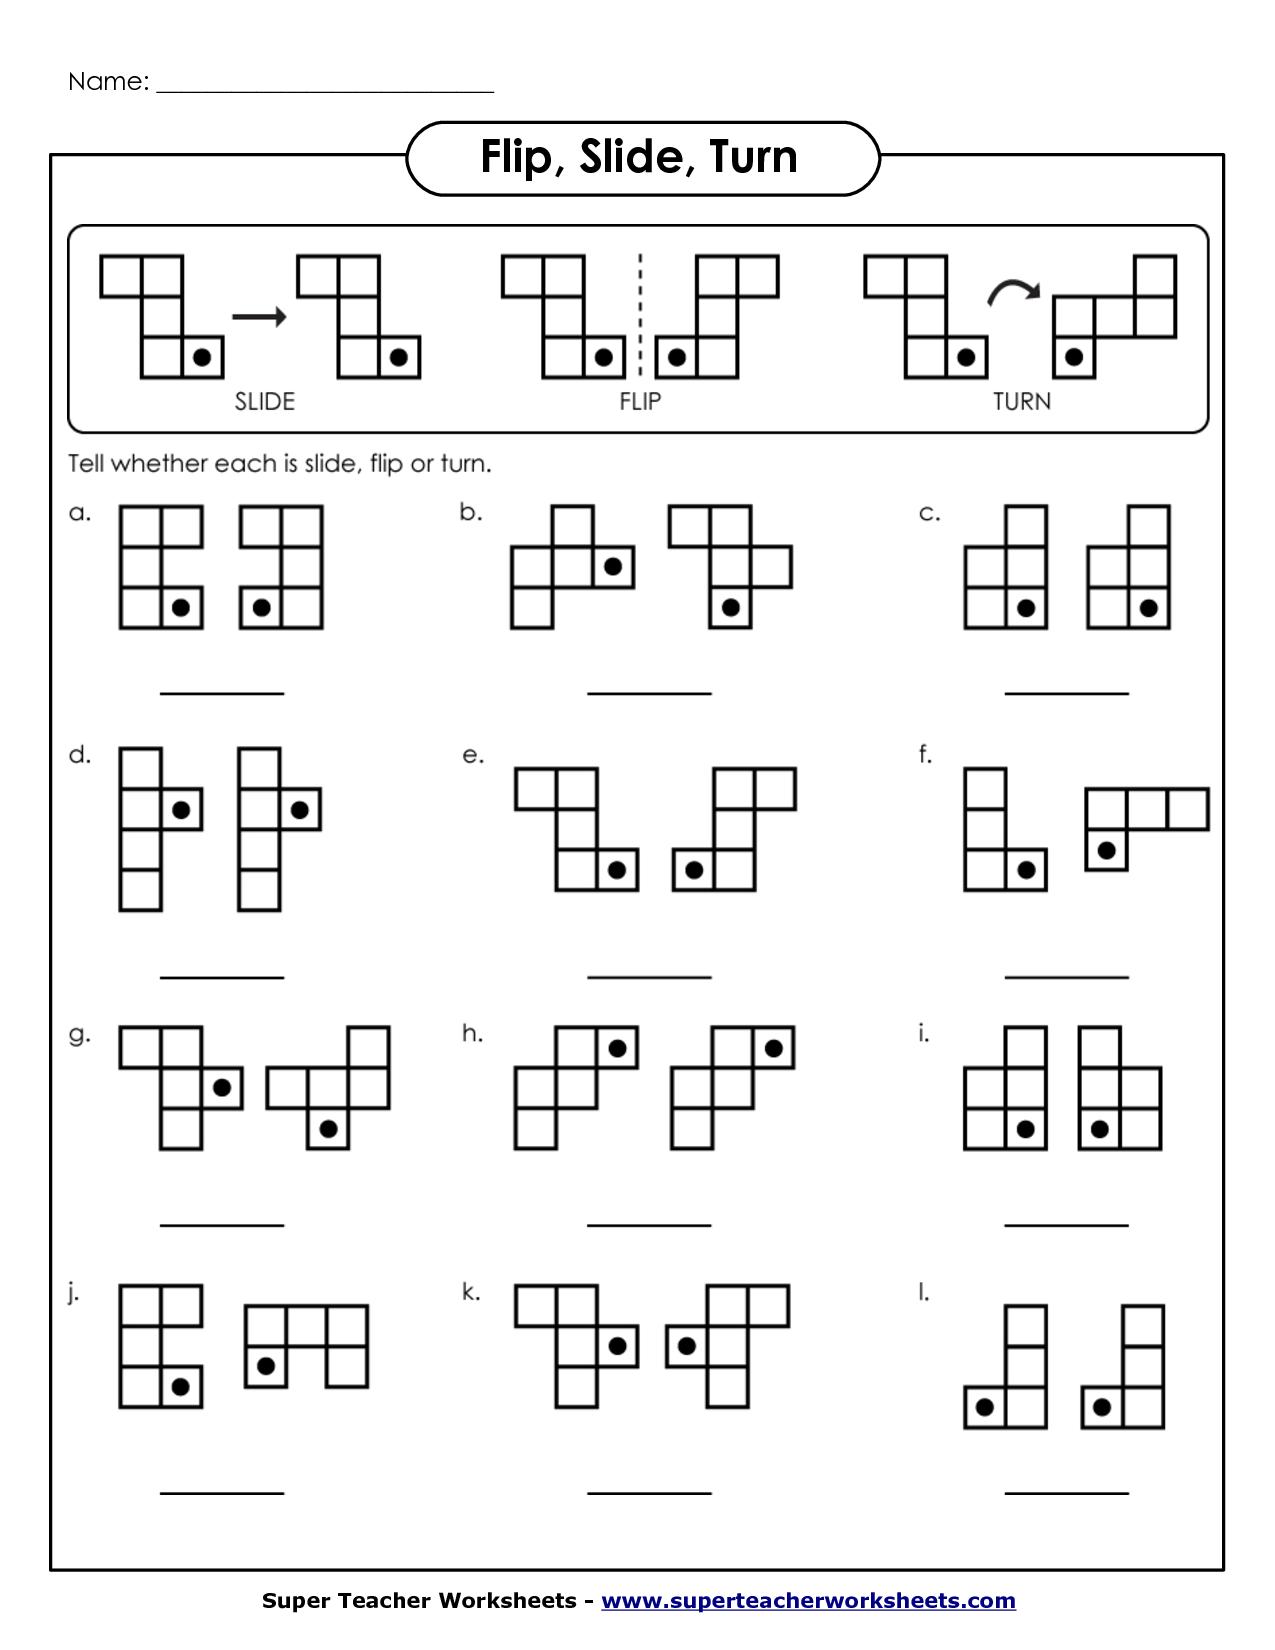 16 Best Images Of Flip Turn Worksheets Printable